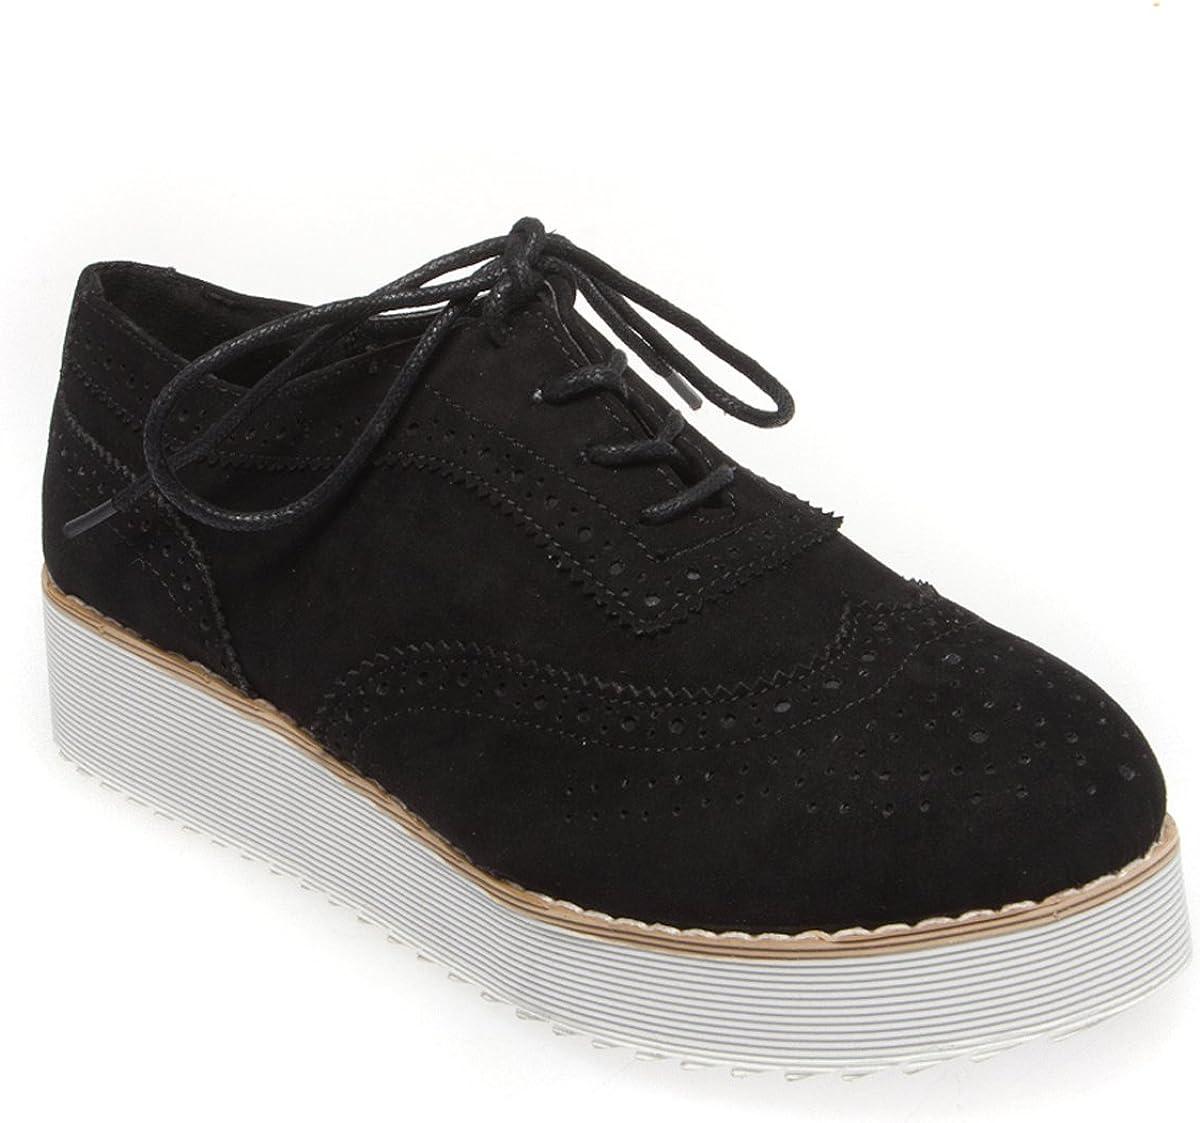 V-Luxury Womens 40-ASPEN1 Round Toe Platform Lace Up Oxford Flat Shoes